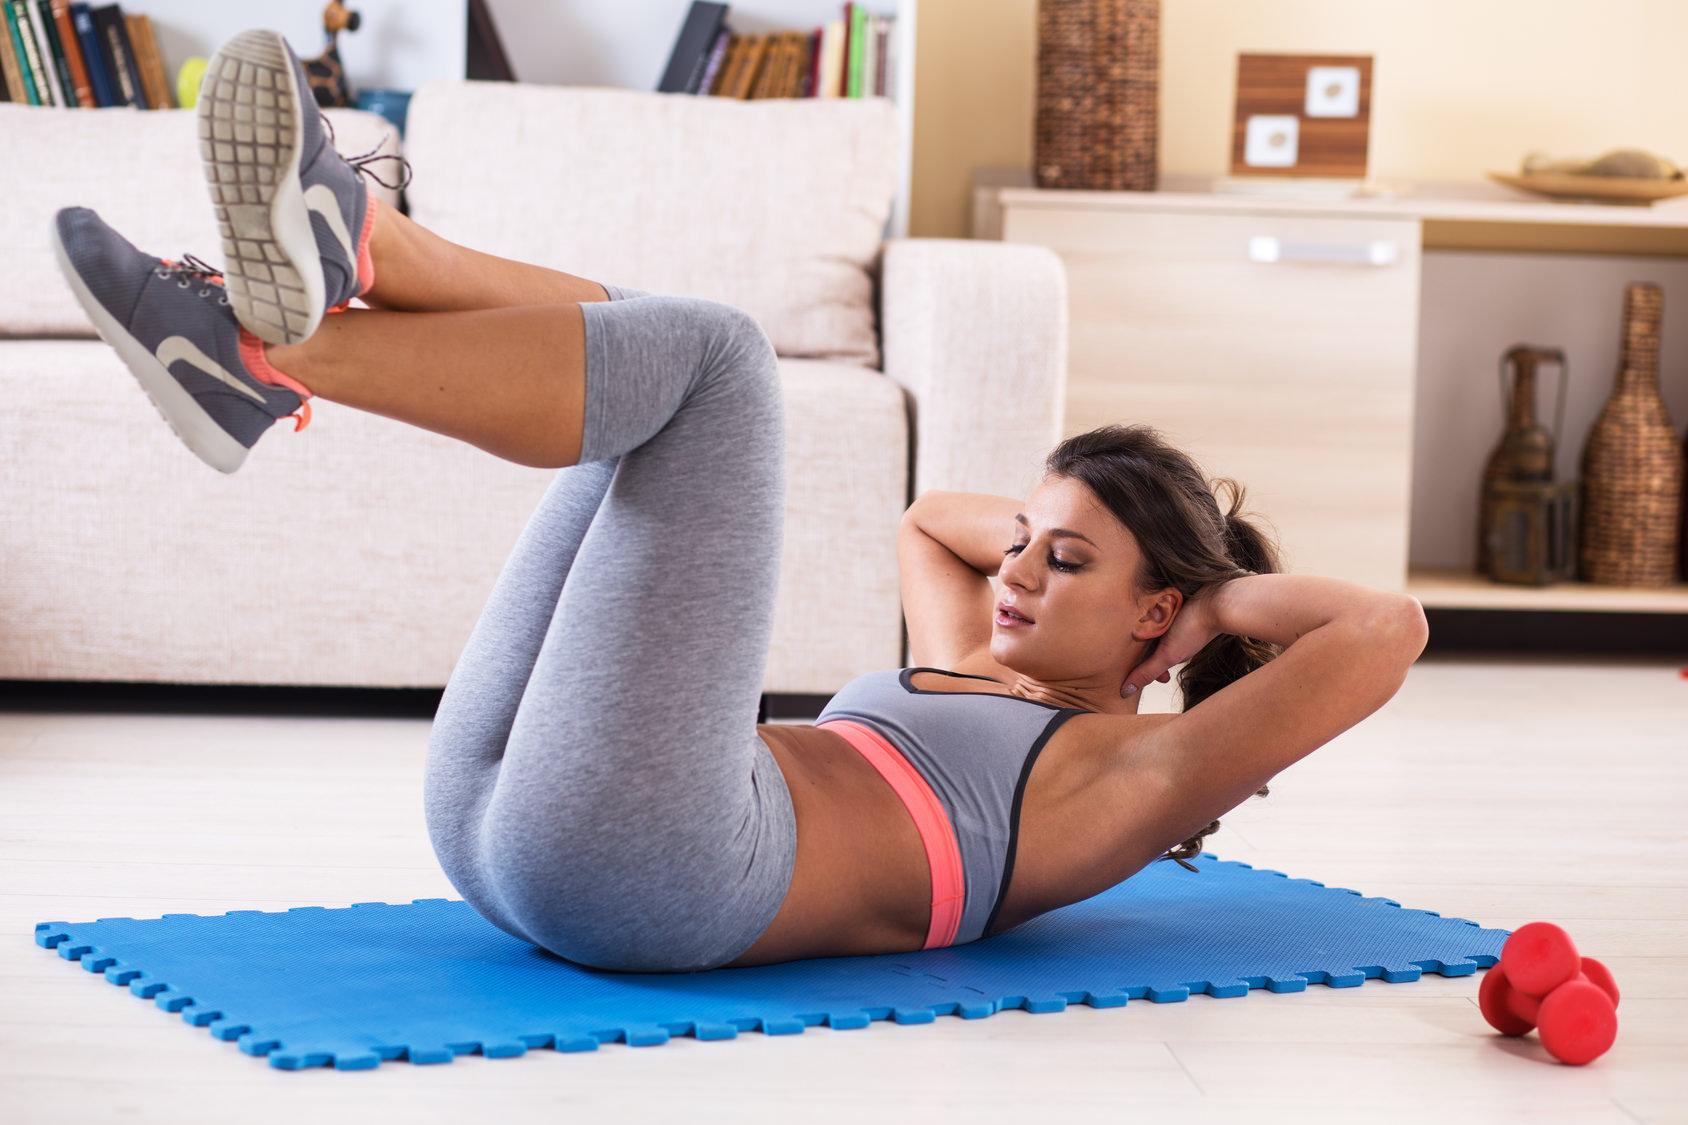 BodyChange Workout